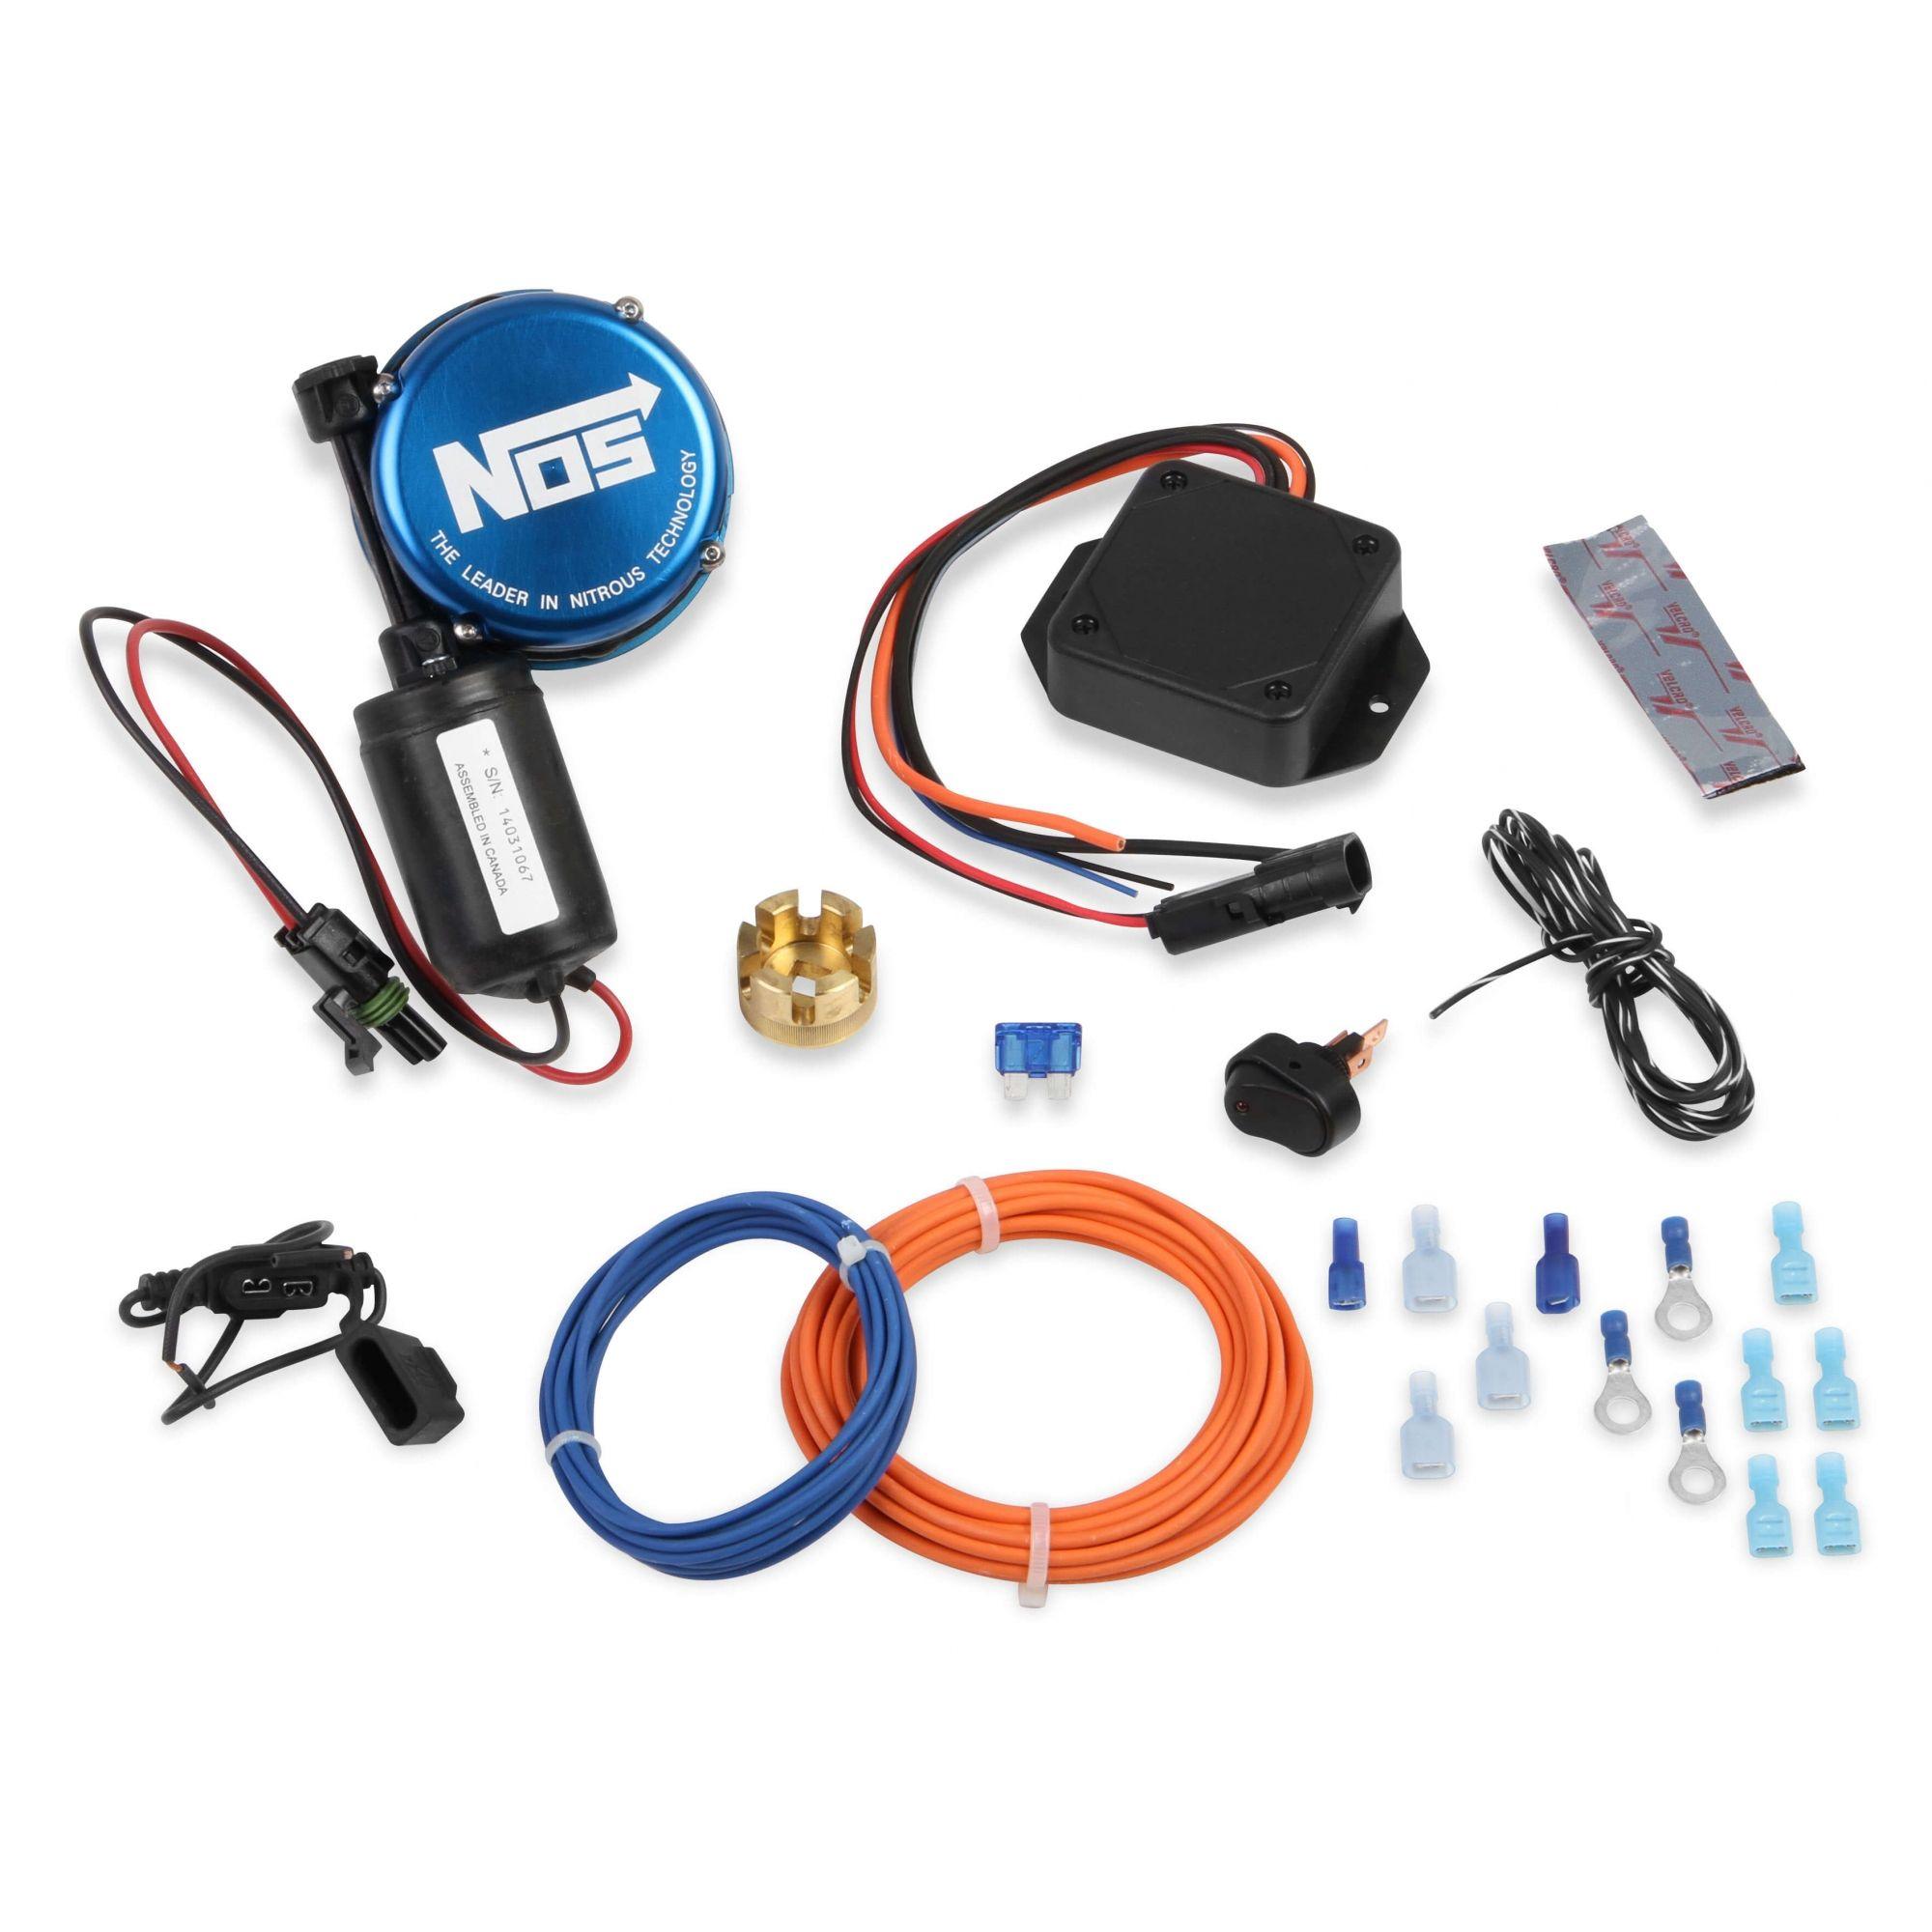 Sistema de Abertura/Fechamento de Cilindro de Nitro Remoto  - PRO-1 Serious Performance